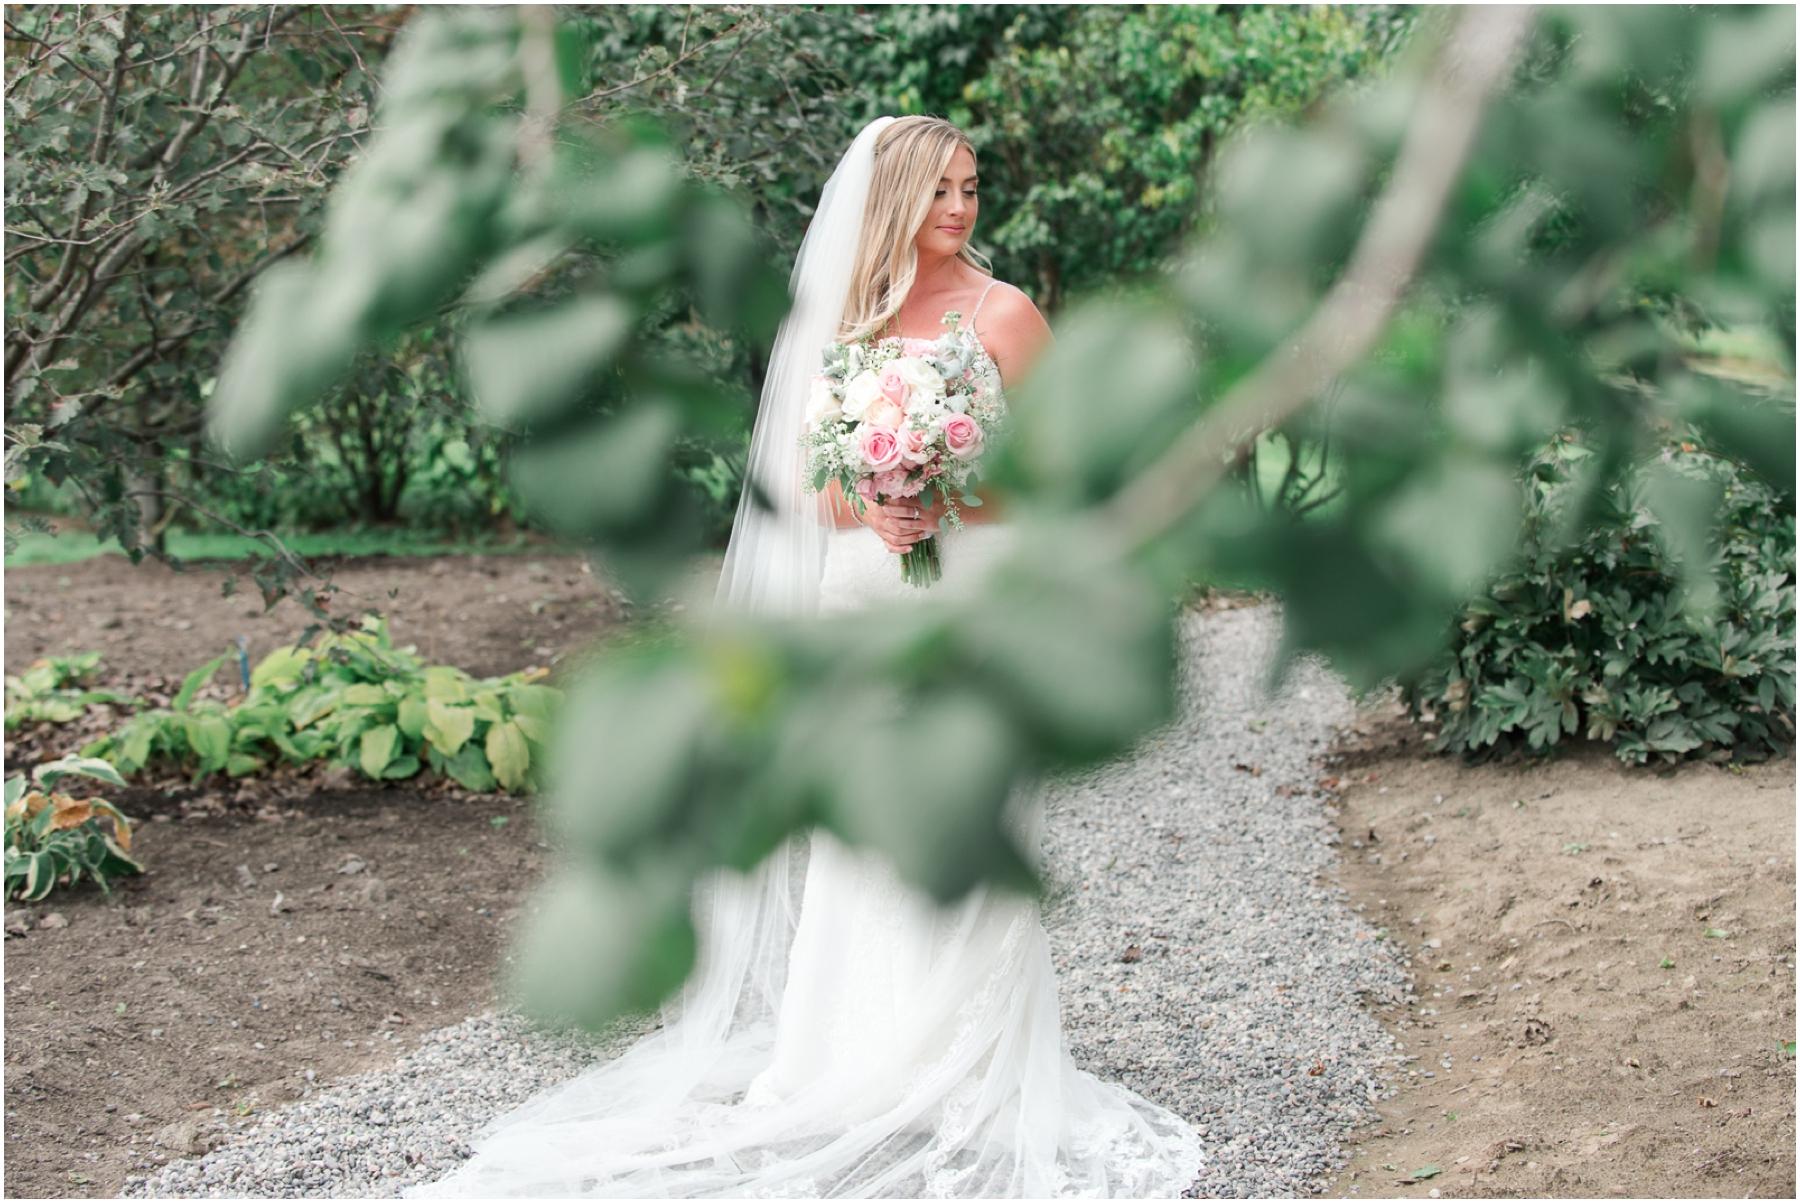 Bloom Field Gardens Wedding Precious Photography Katherine & Chris_022